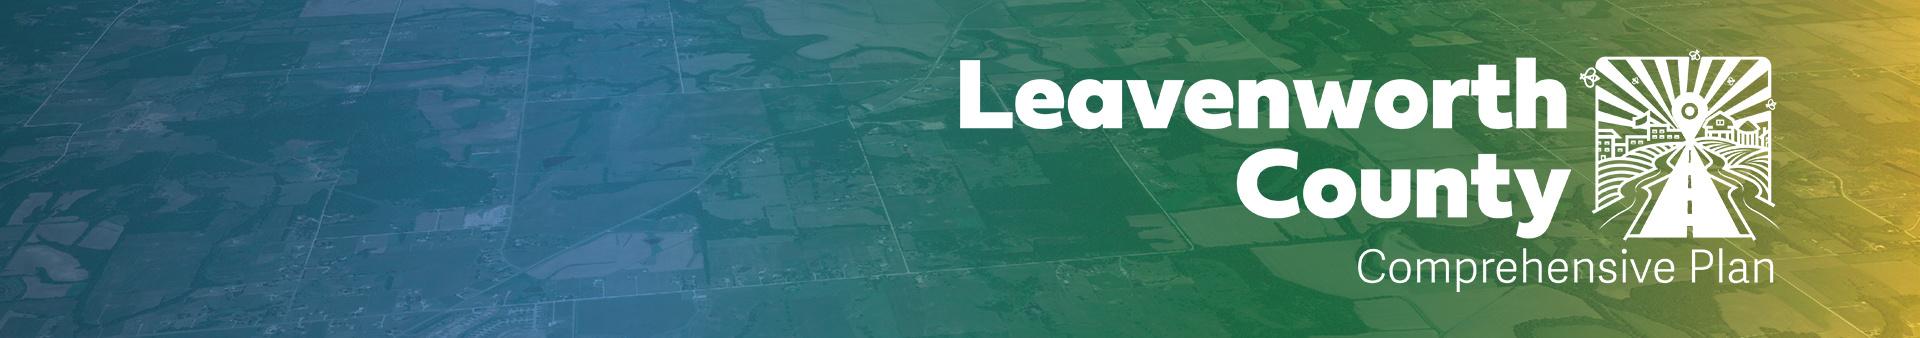 Leavenworth County Comprehensive Plan